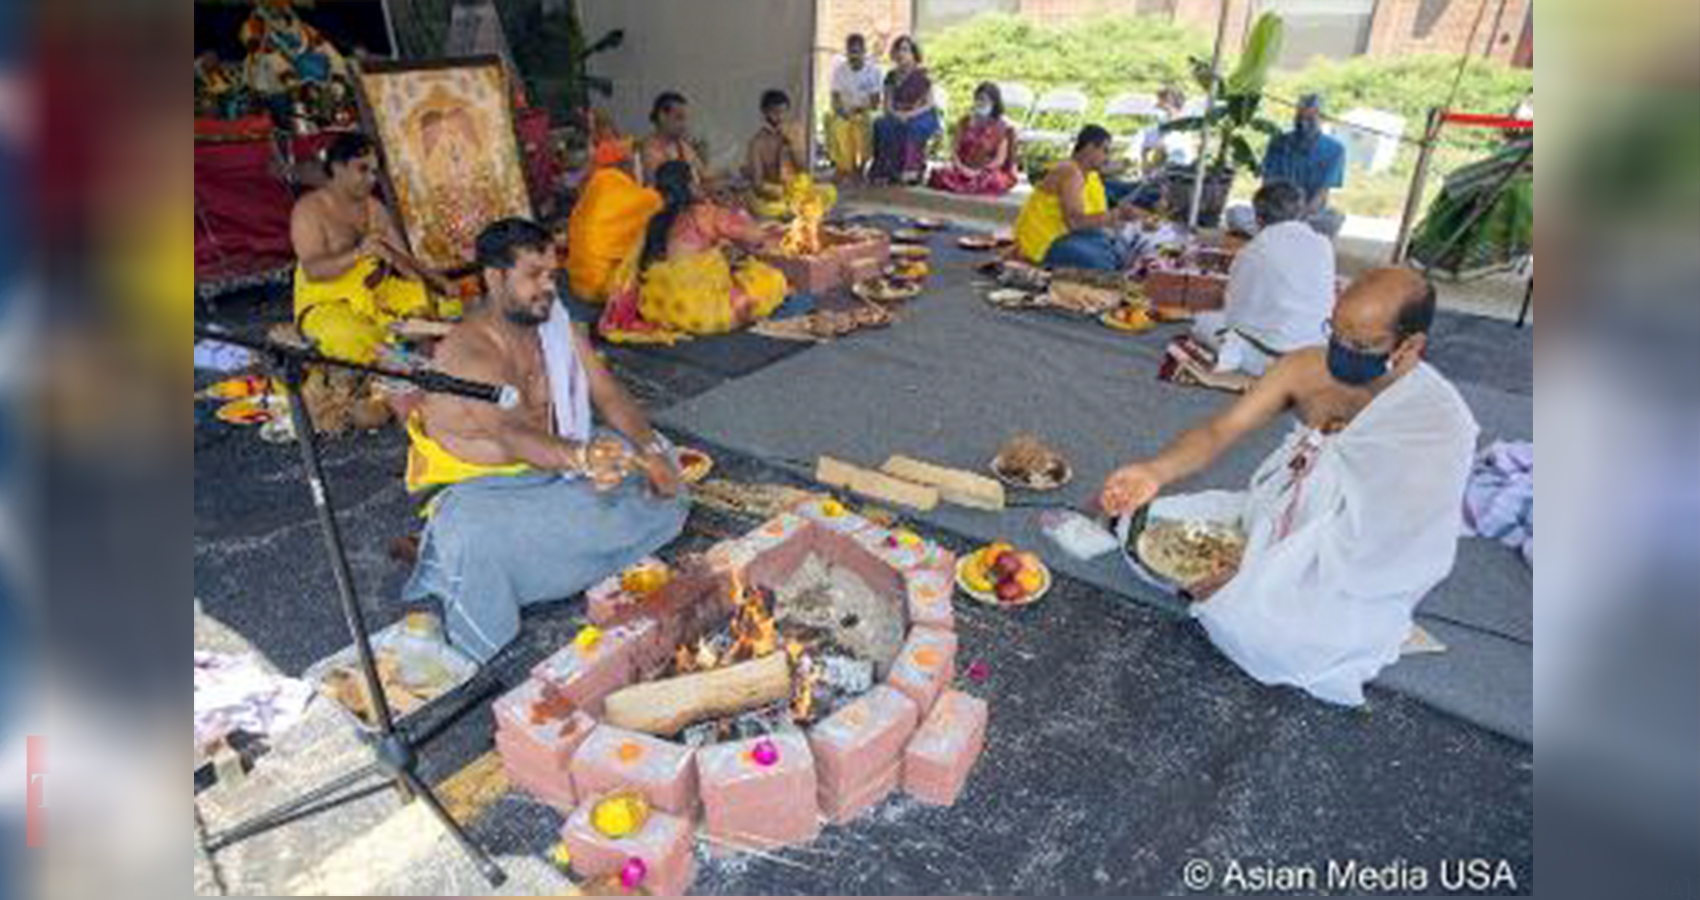 Shri Shirdi Sai Mandir To Help In Psychological And Spiritual Needs Of The Community